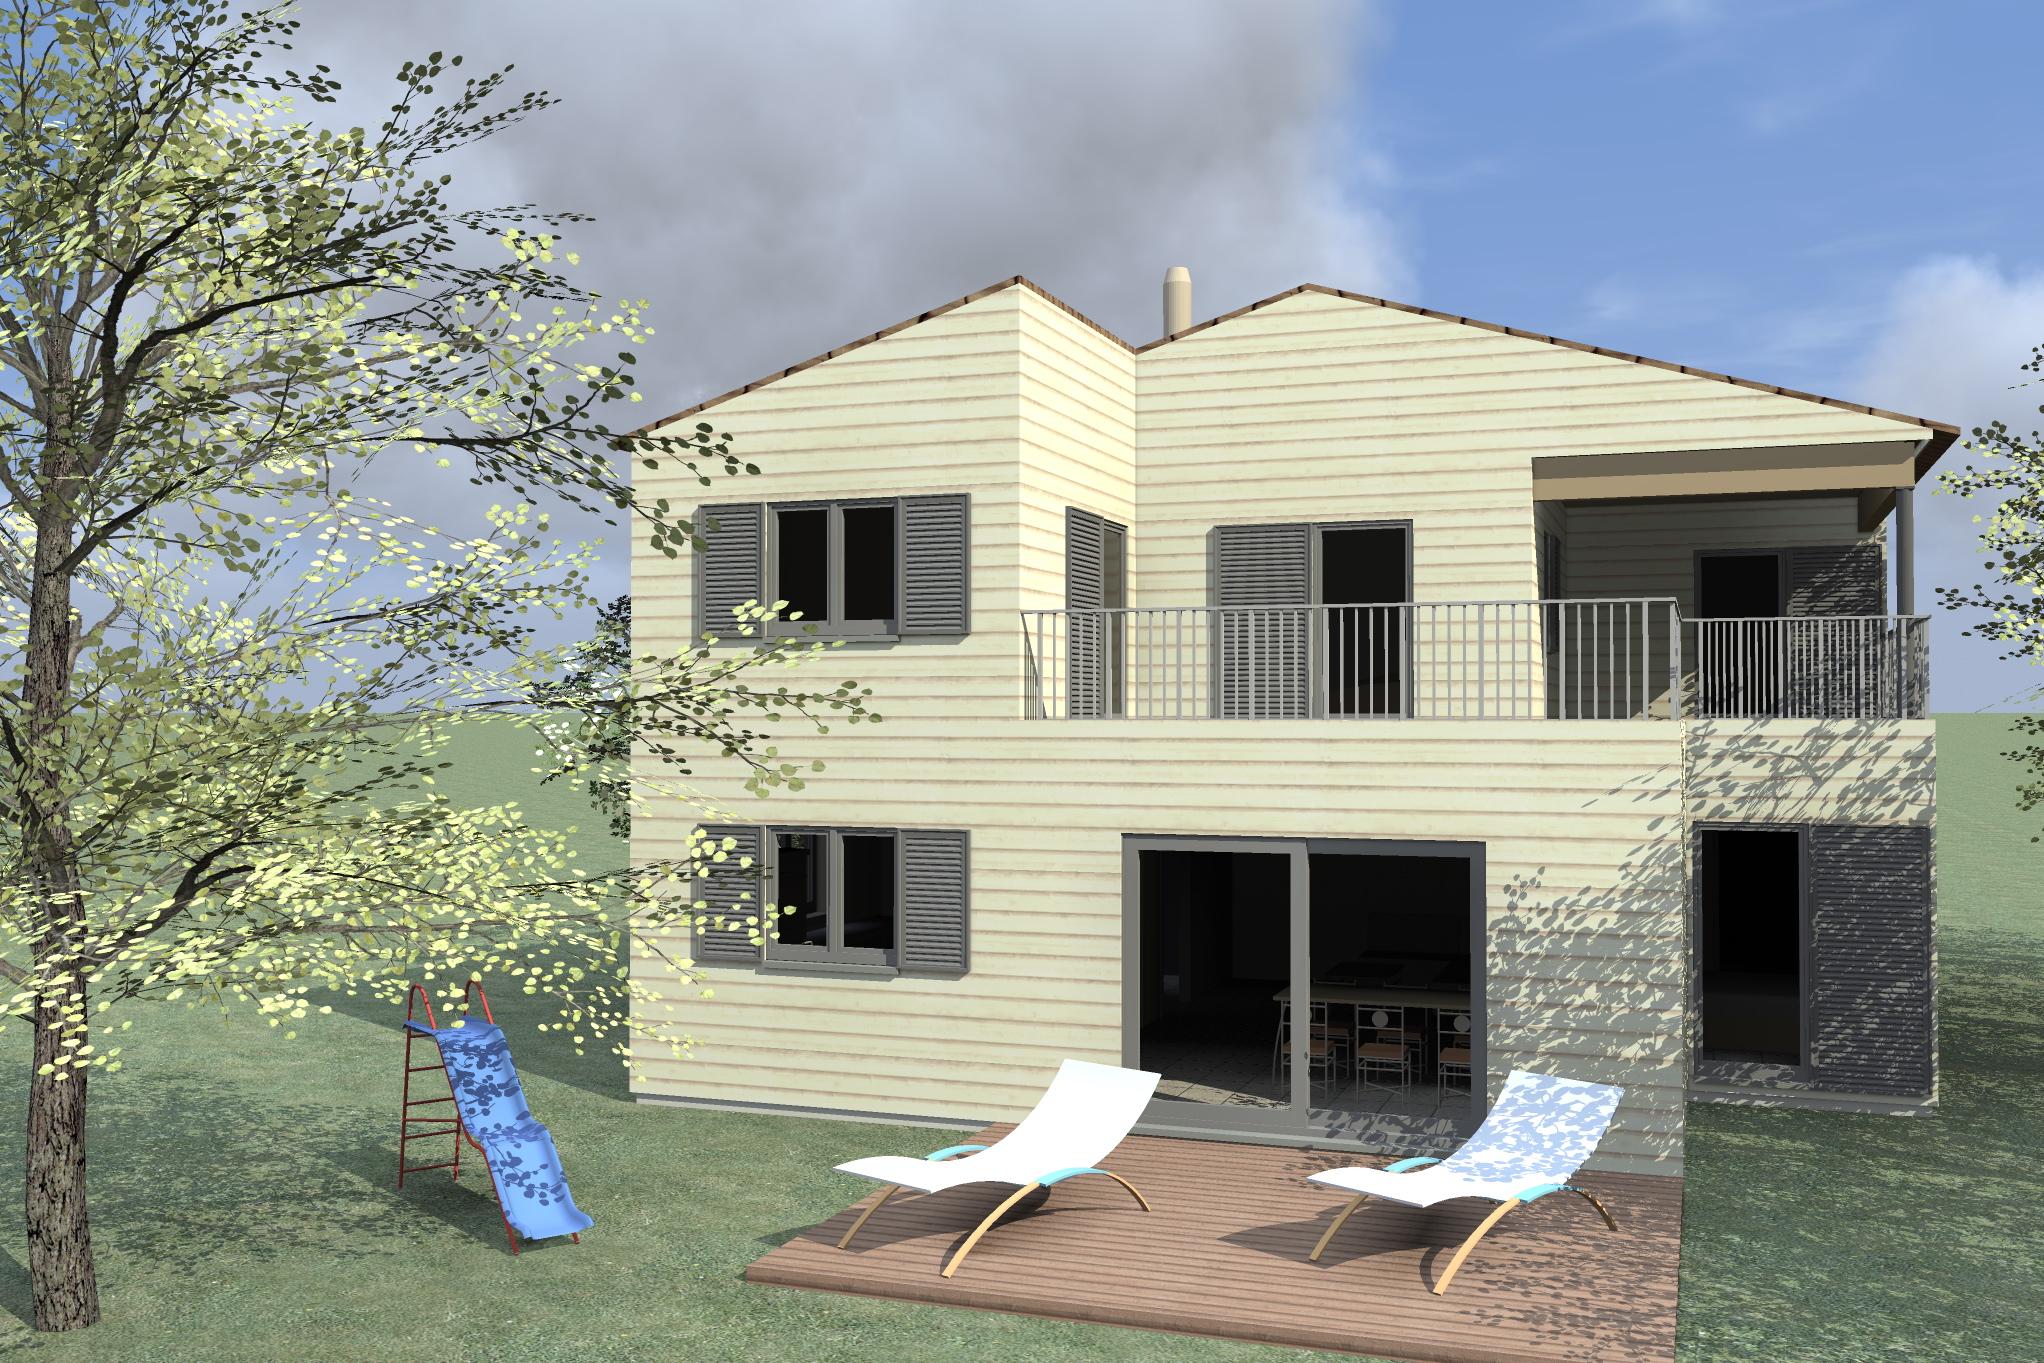 marseille maison bois c t sud. Black Bedroom Furniture Sets. Home Design Ideas